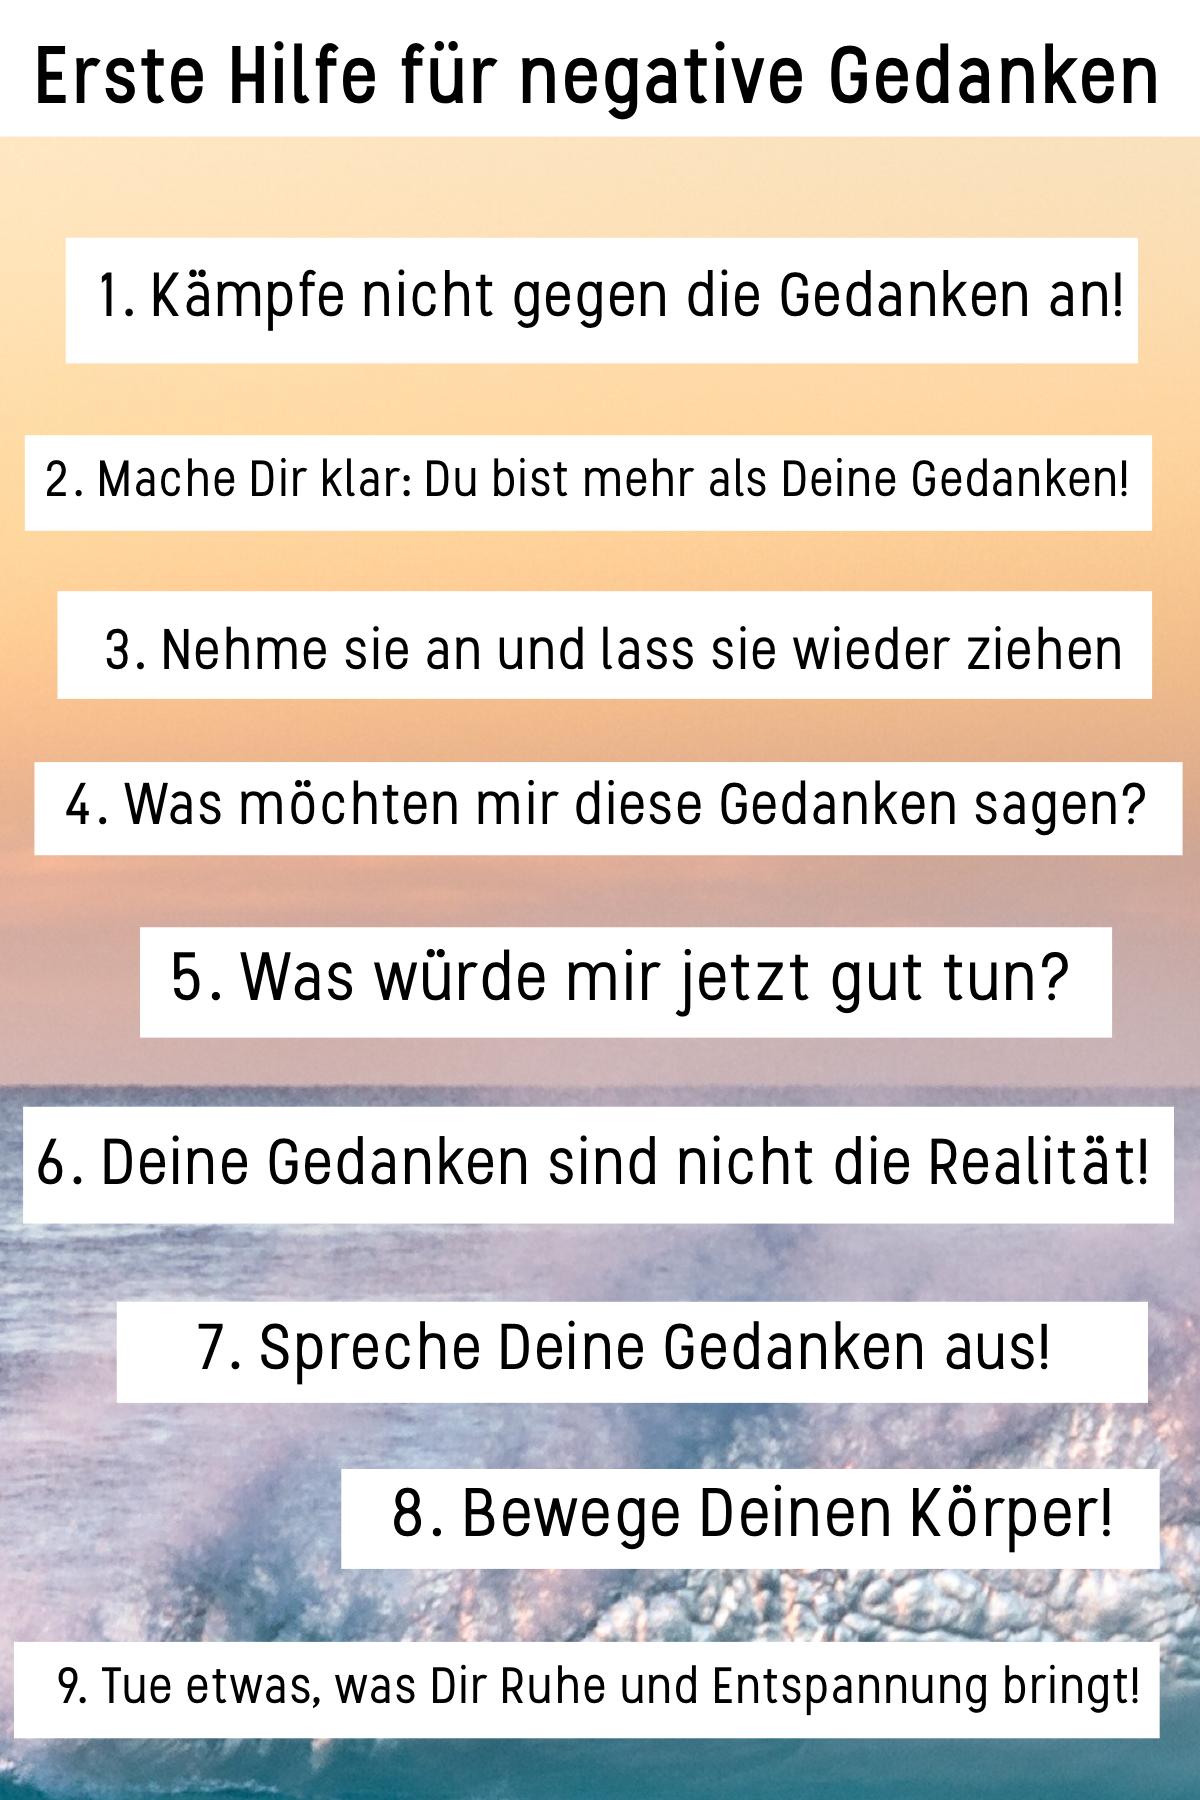 Online Glücks Kurs - Famous Last Words